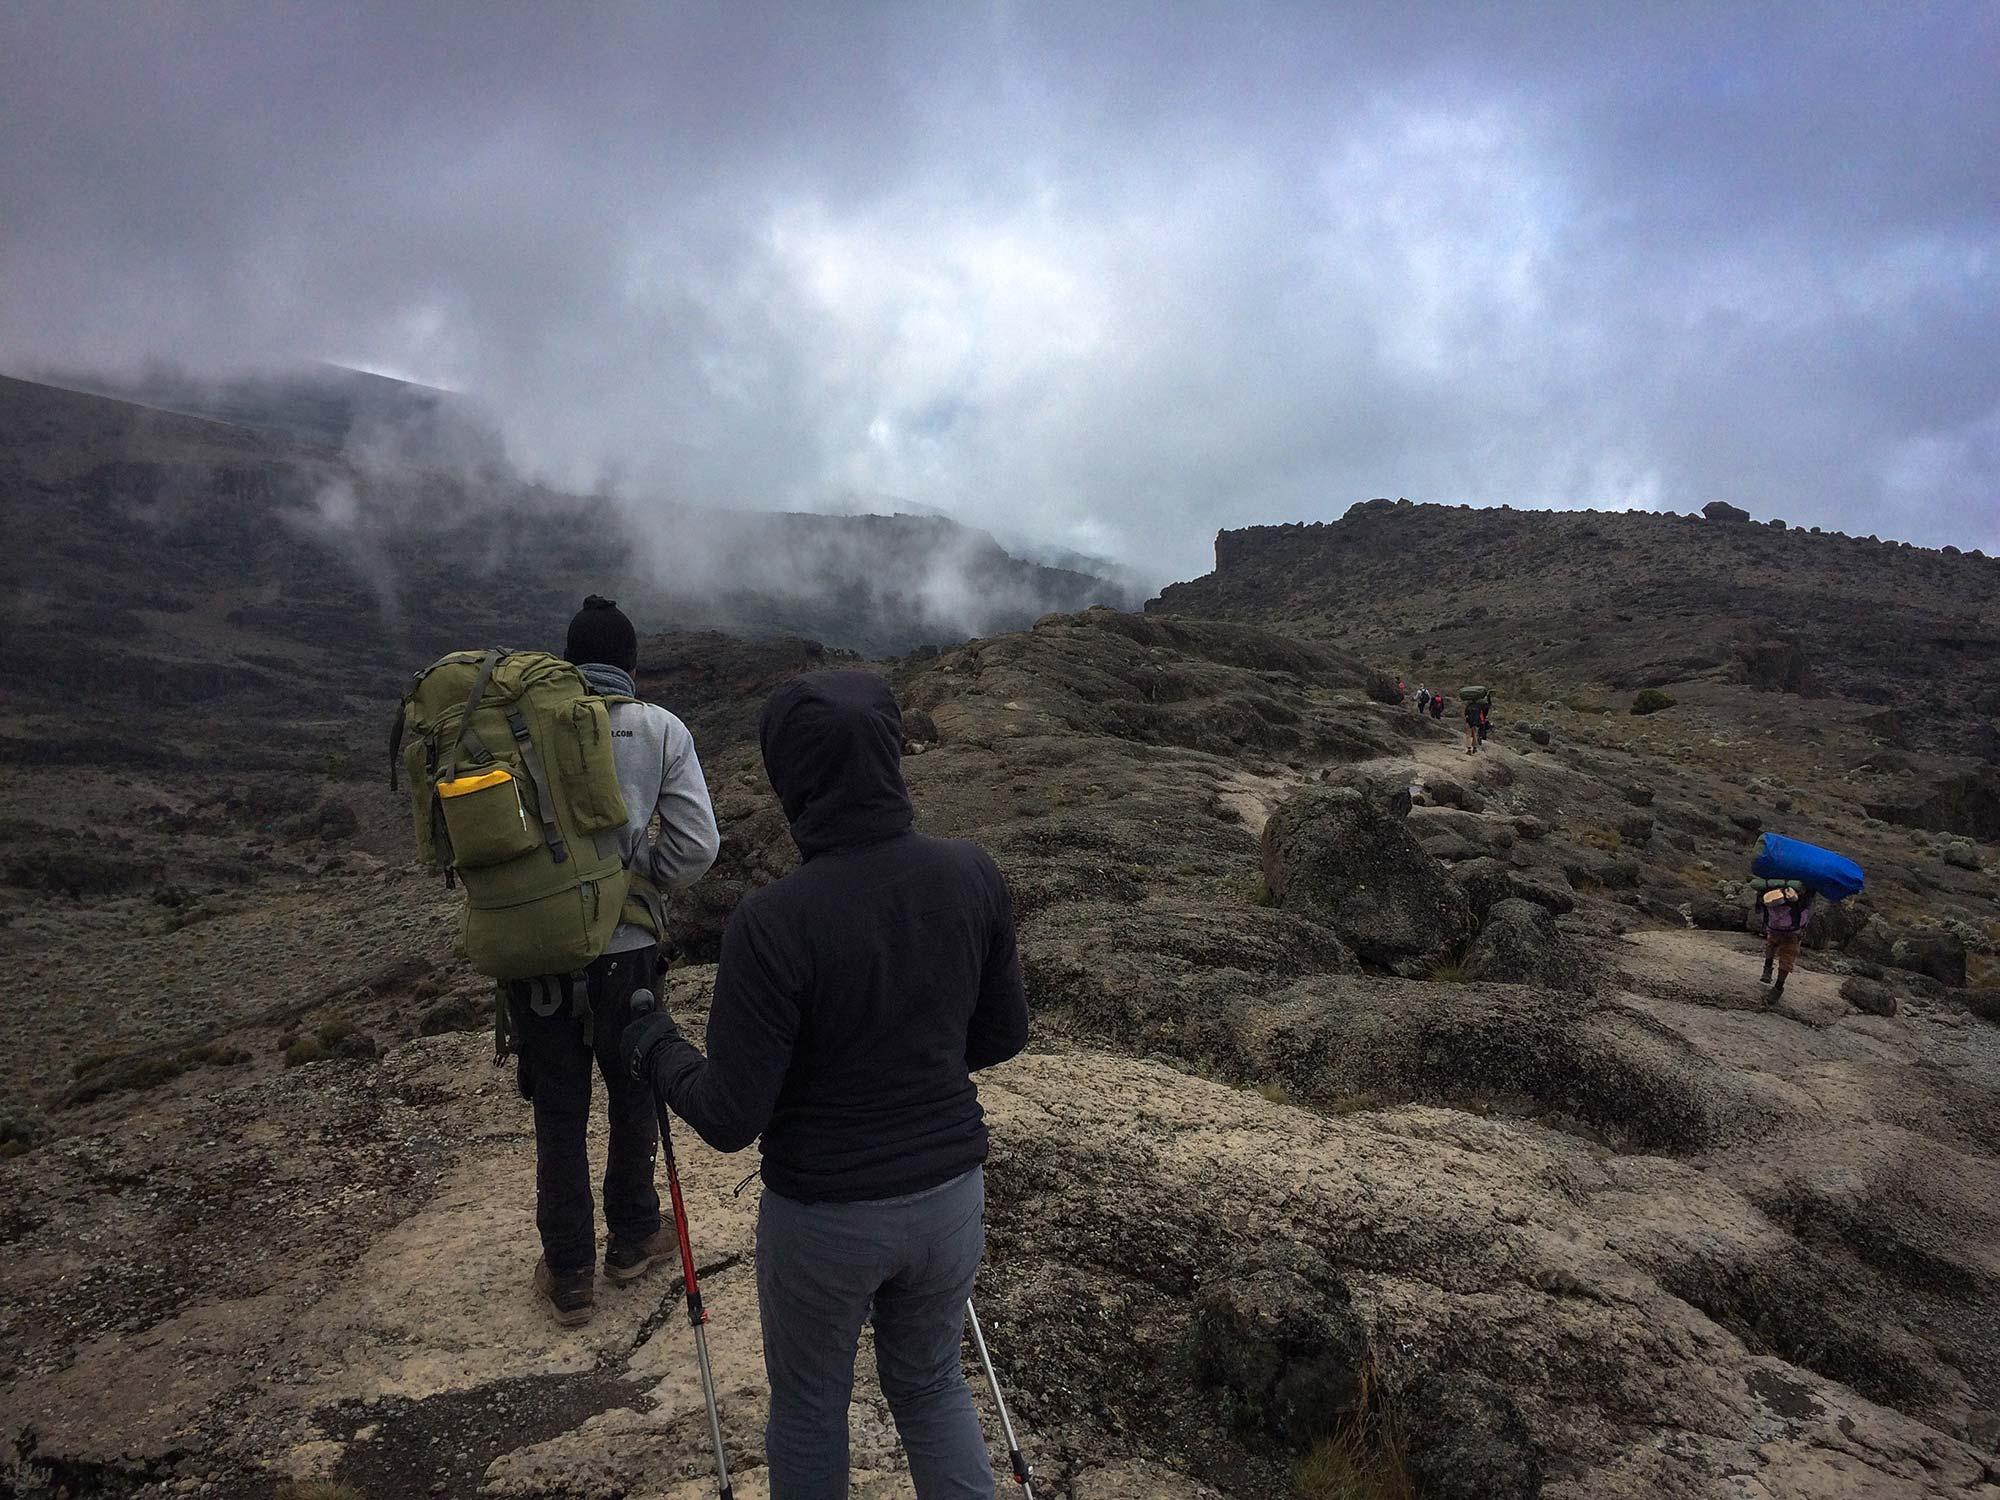 D5-14-welcome-flat-ground-atop-barranco-wall-kilimanjaro.jpg